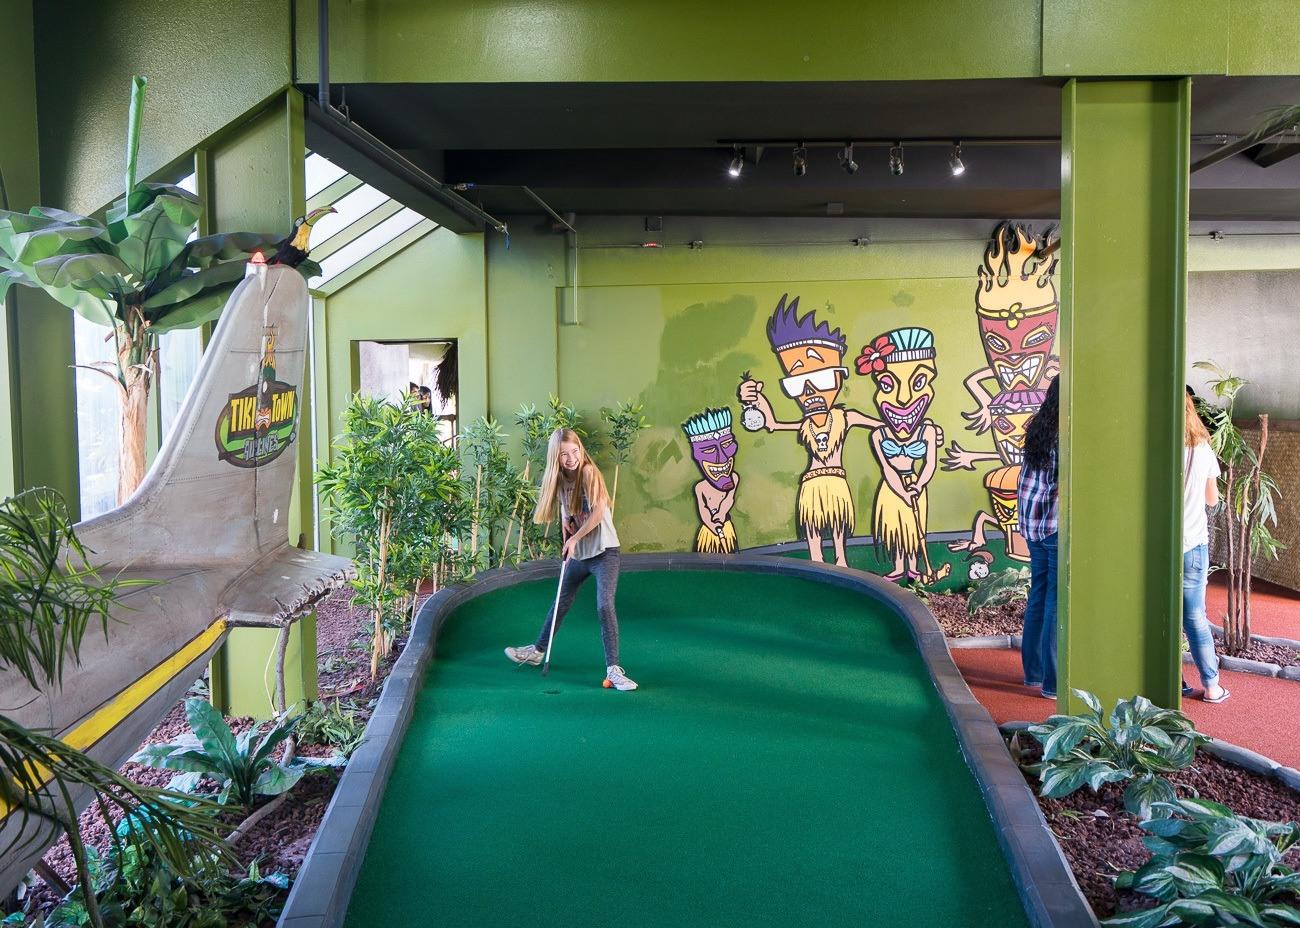 Miniature golf at Belmont Park in San Diego.